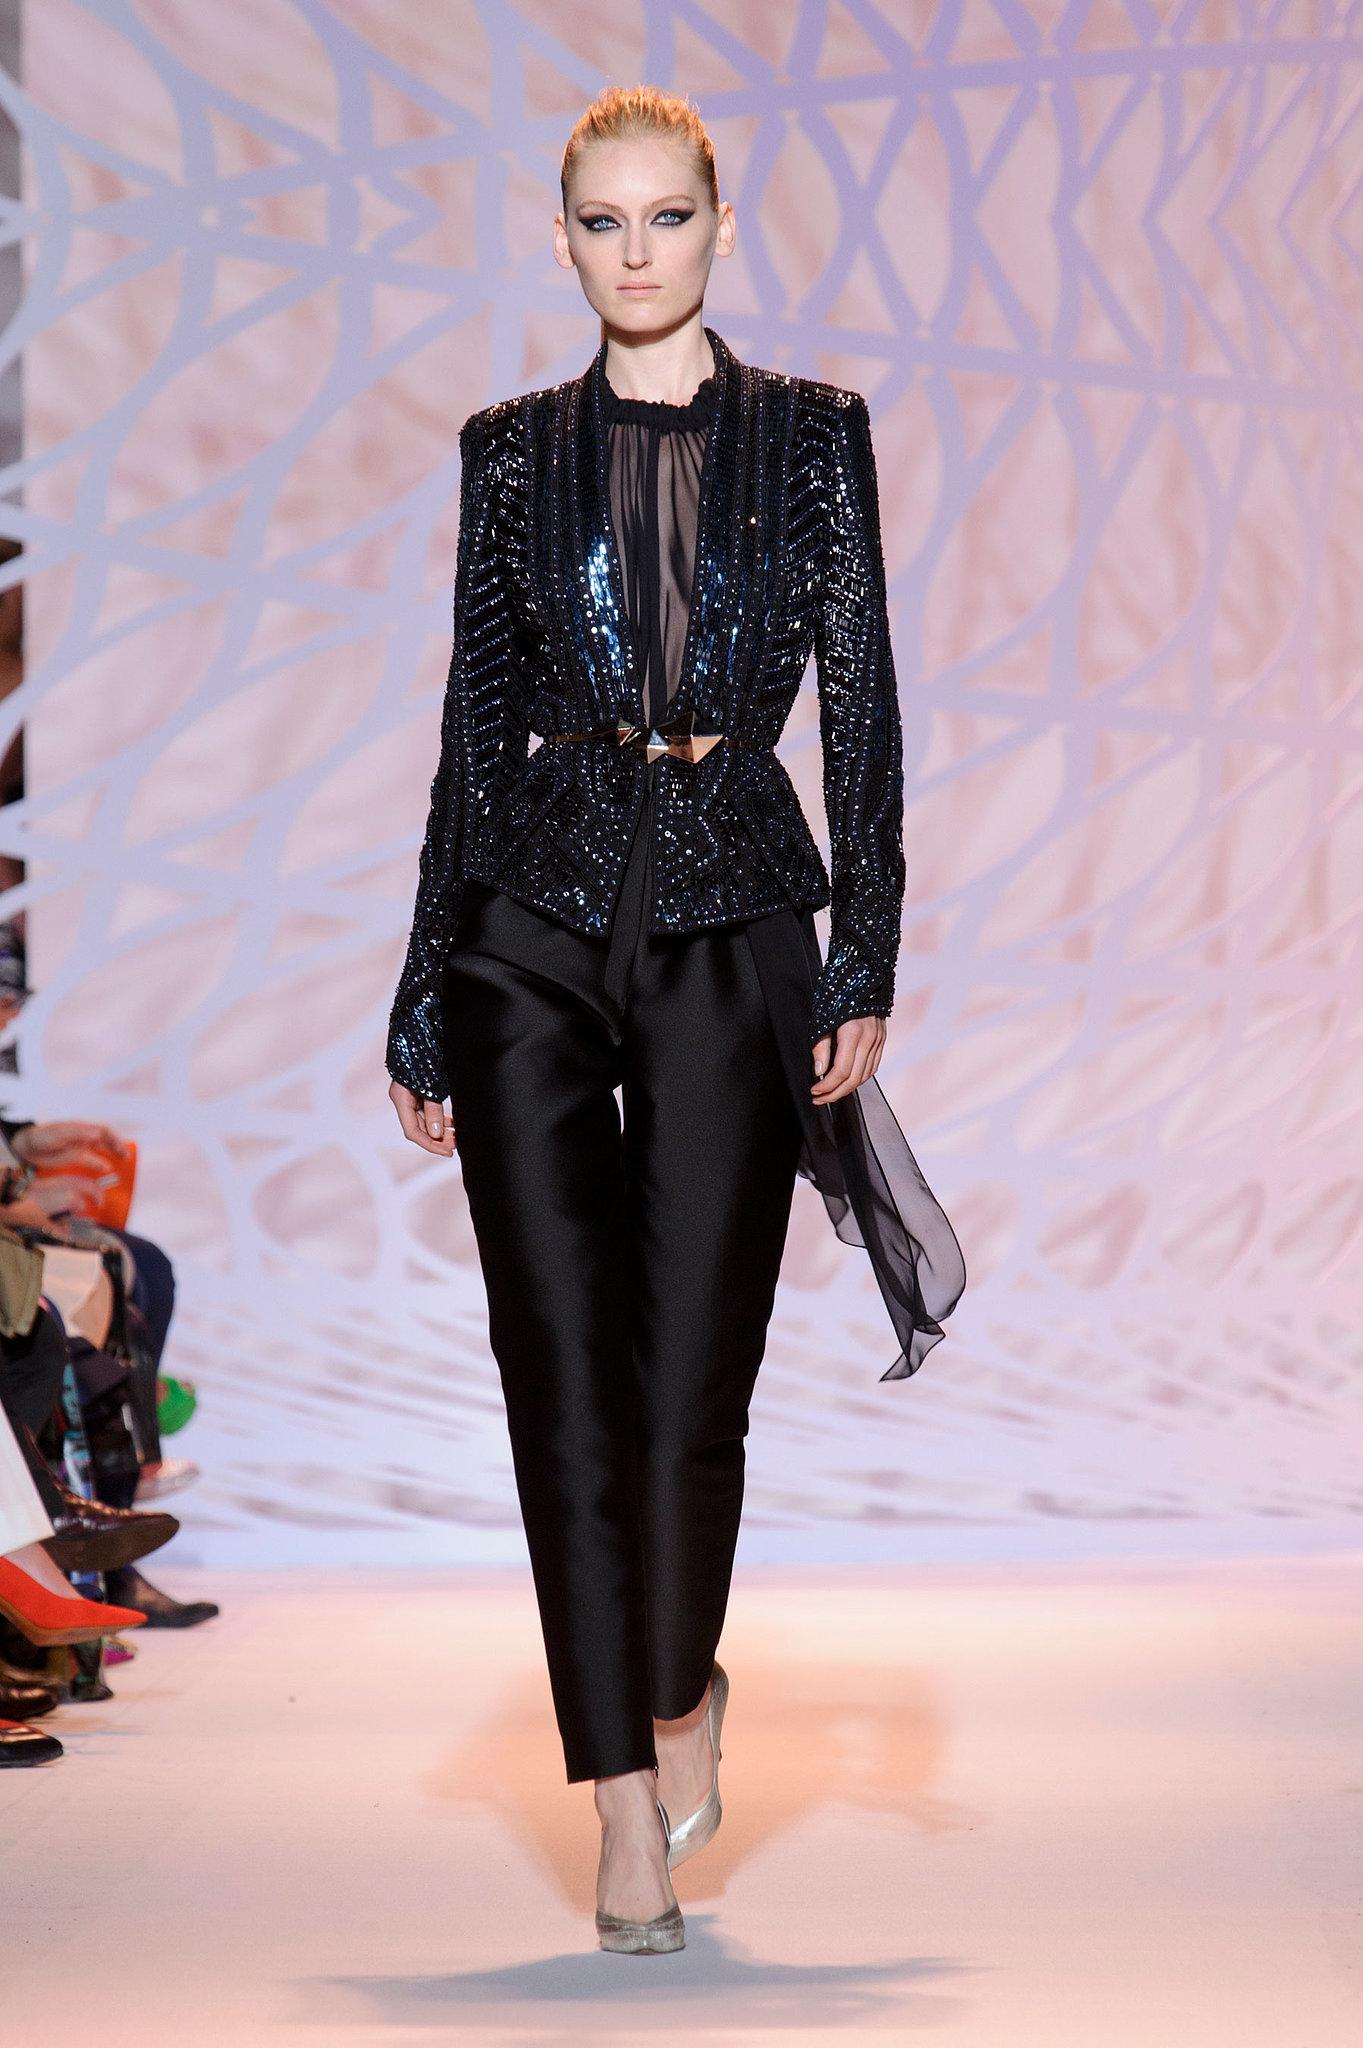 Zuhair-Murad-Haute-Couture-Fall-2014 (1)